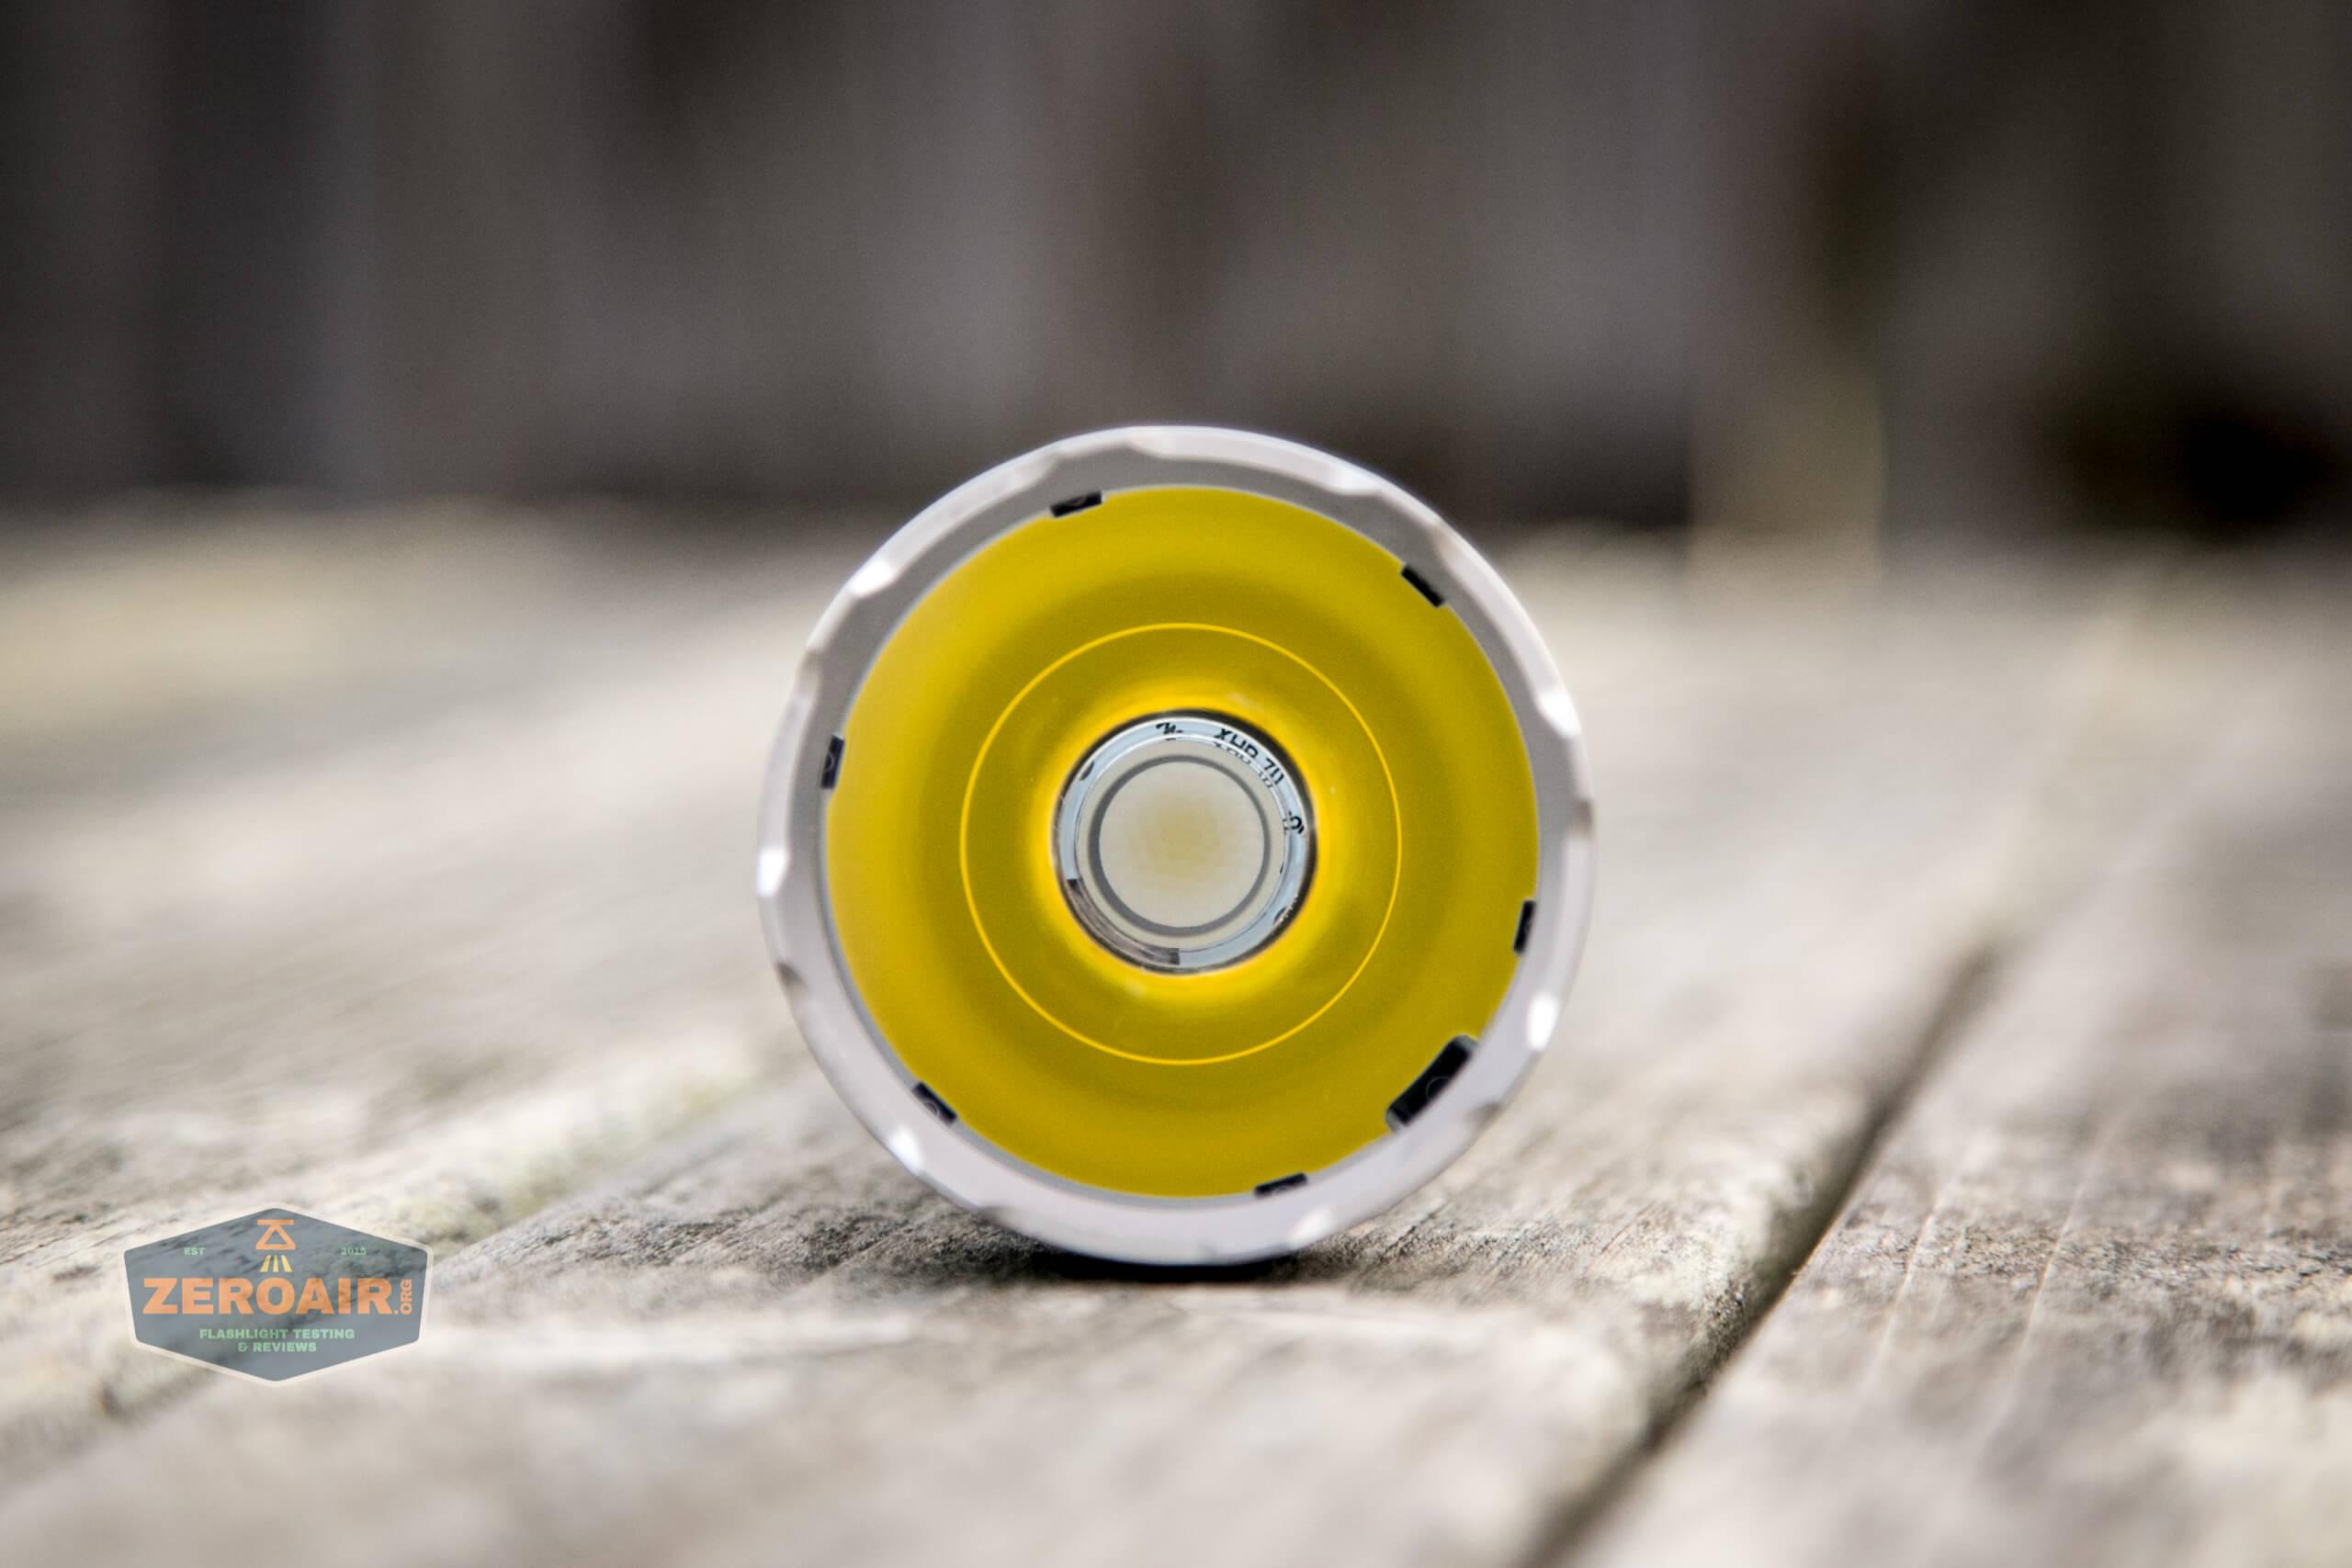 acebeam l35 flashlight cree xhp70.2 emitter